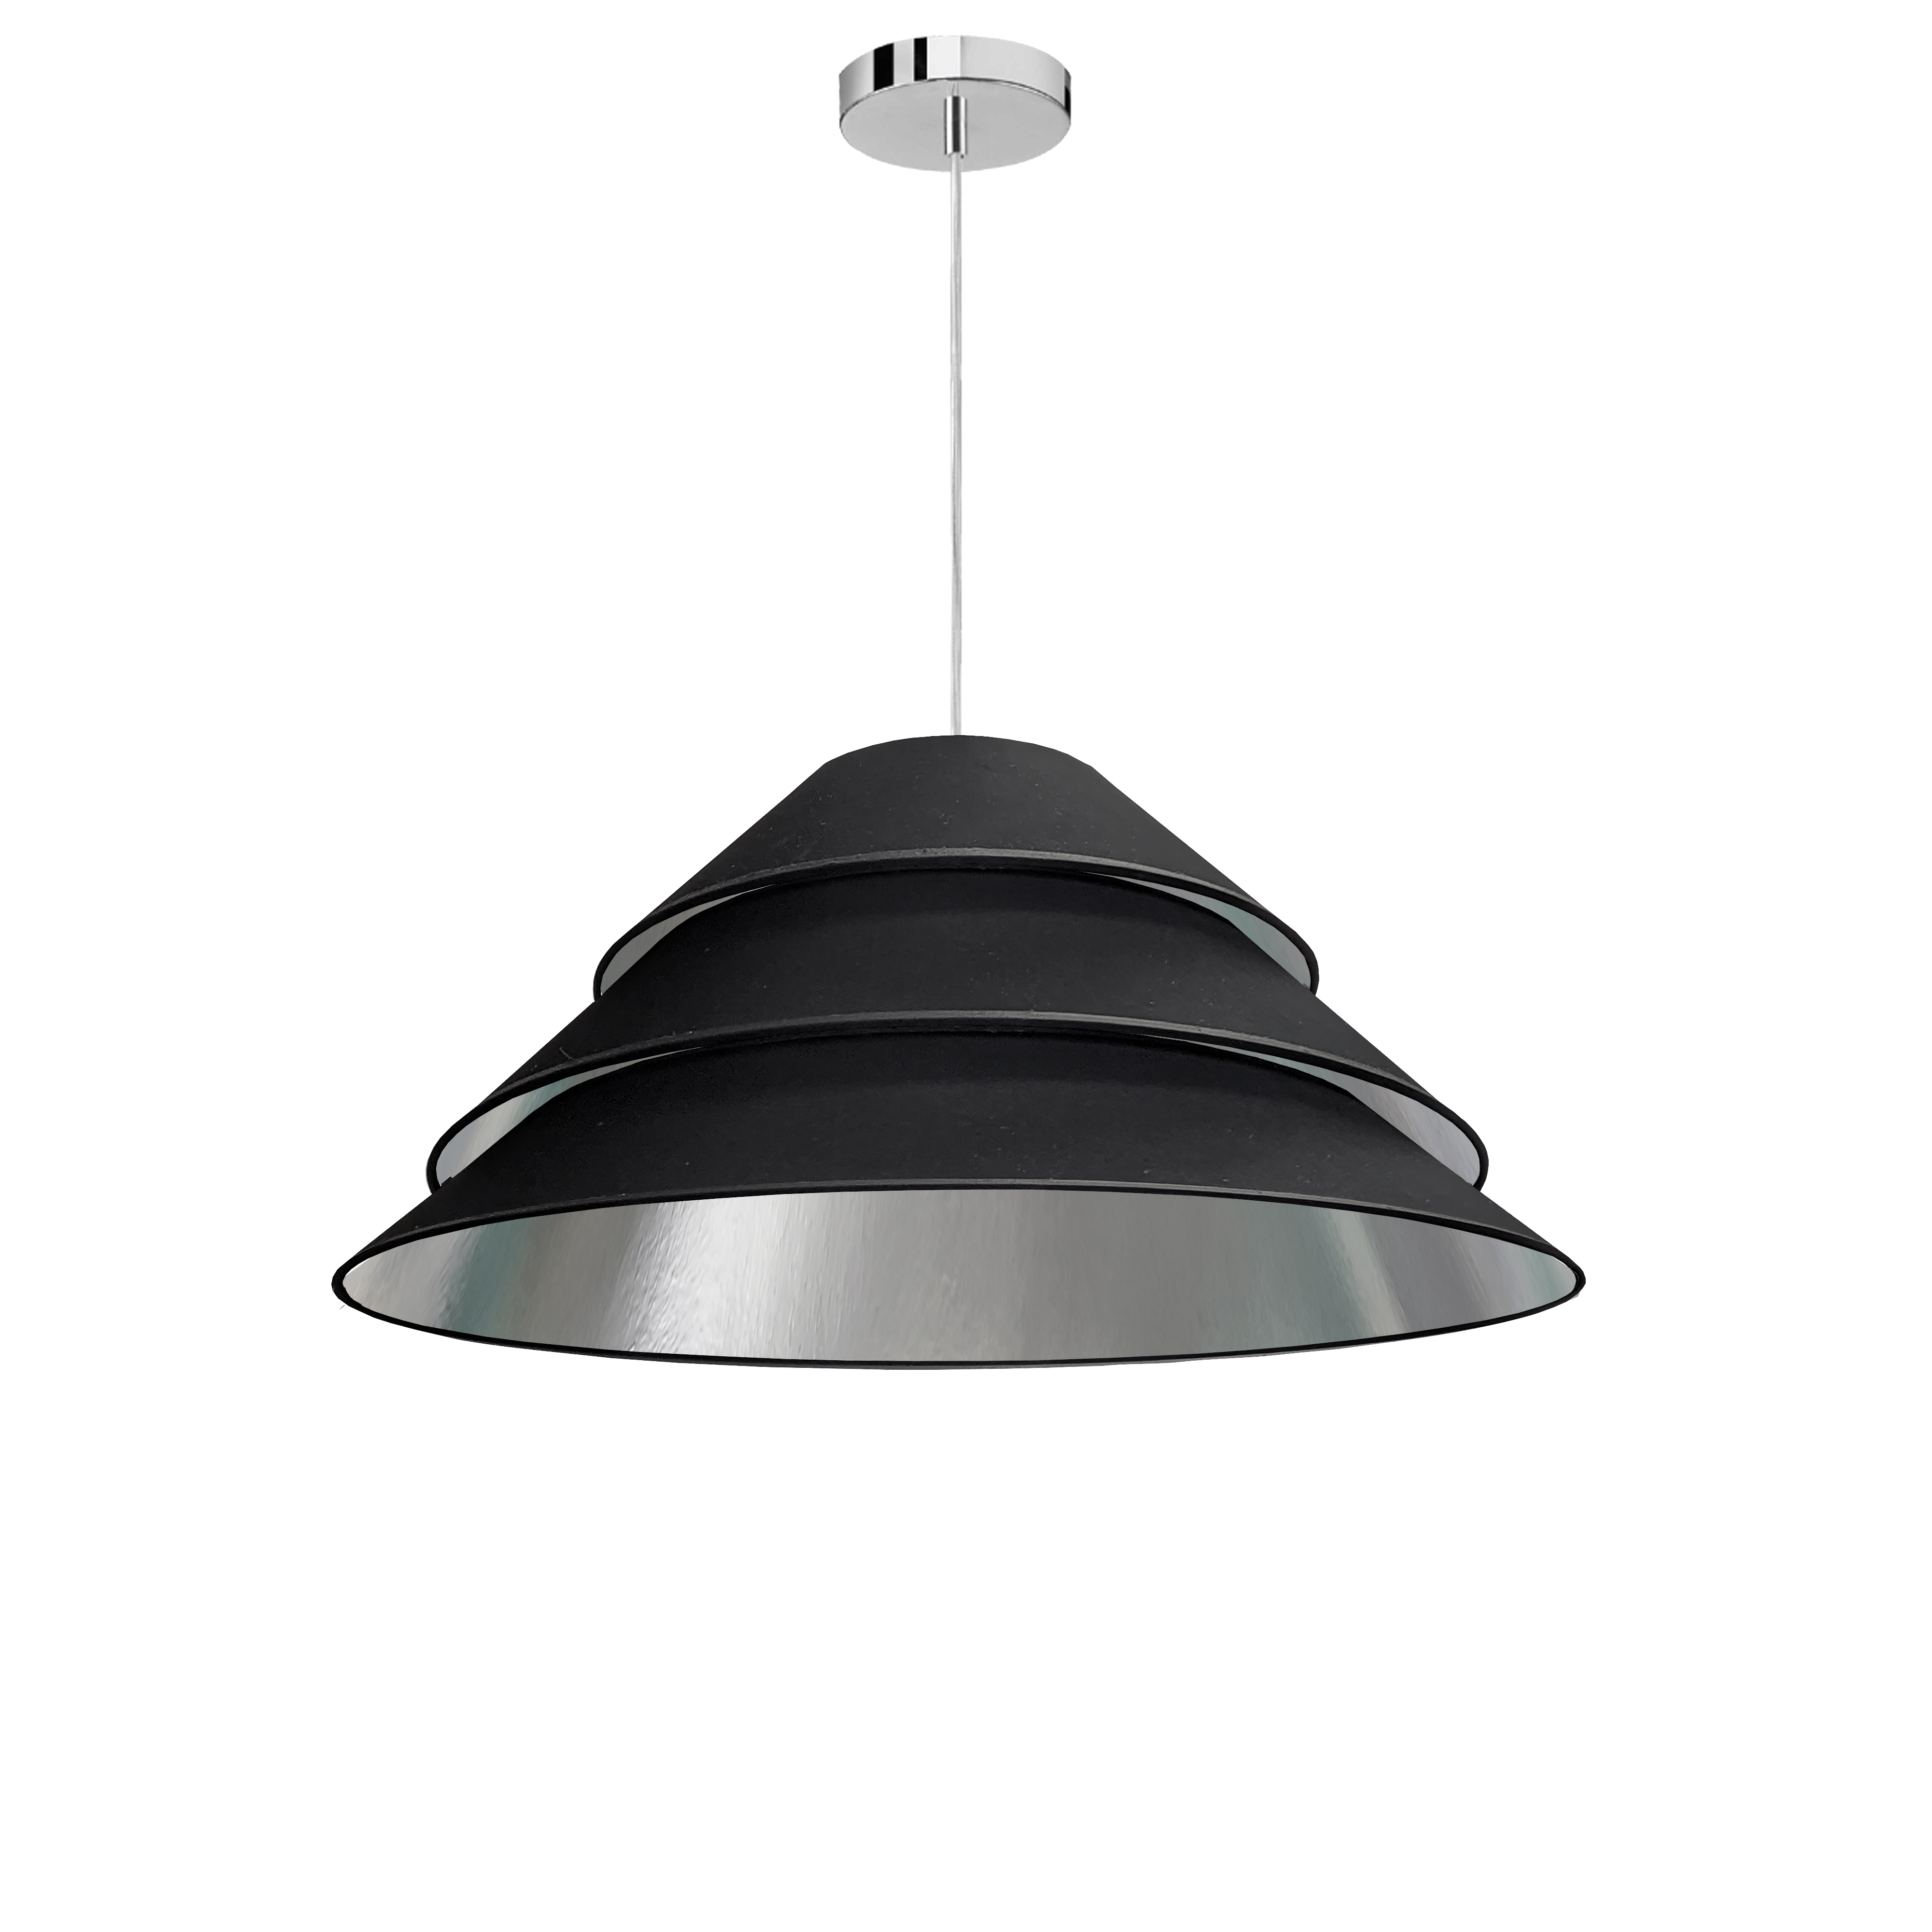 1Light Aranza Pendant, Black/Silver Shade, Polished Chrome